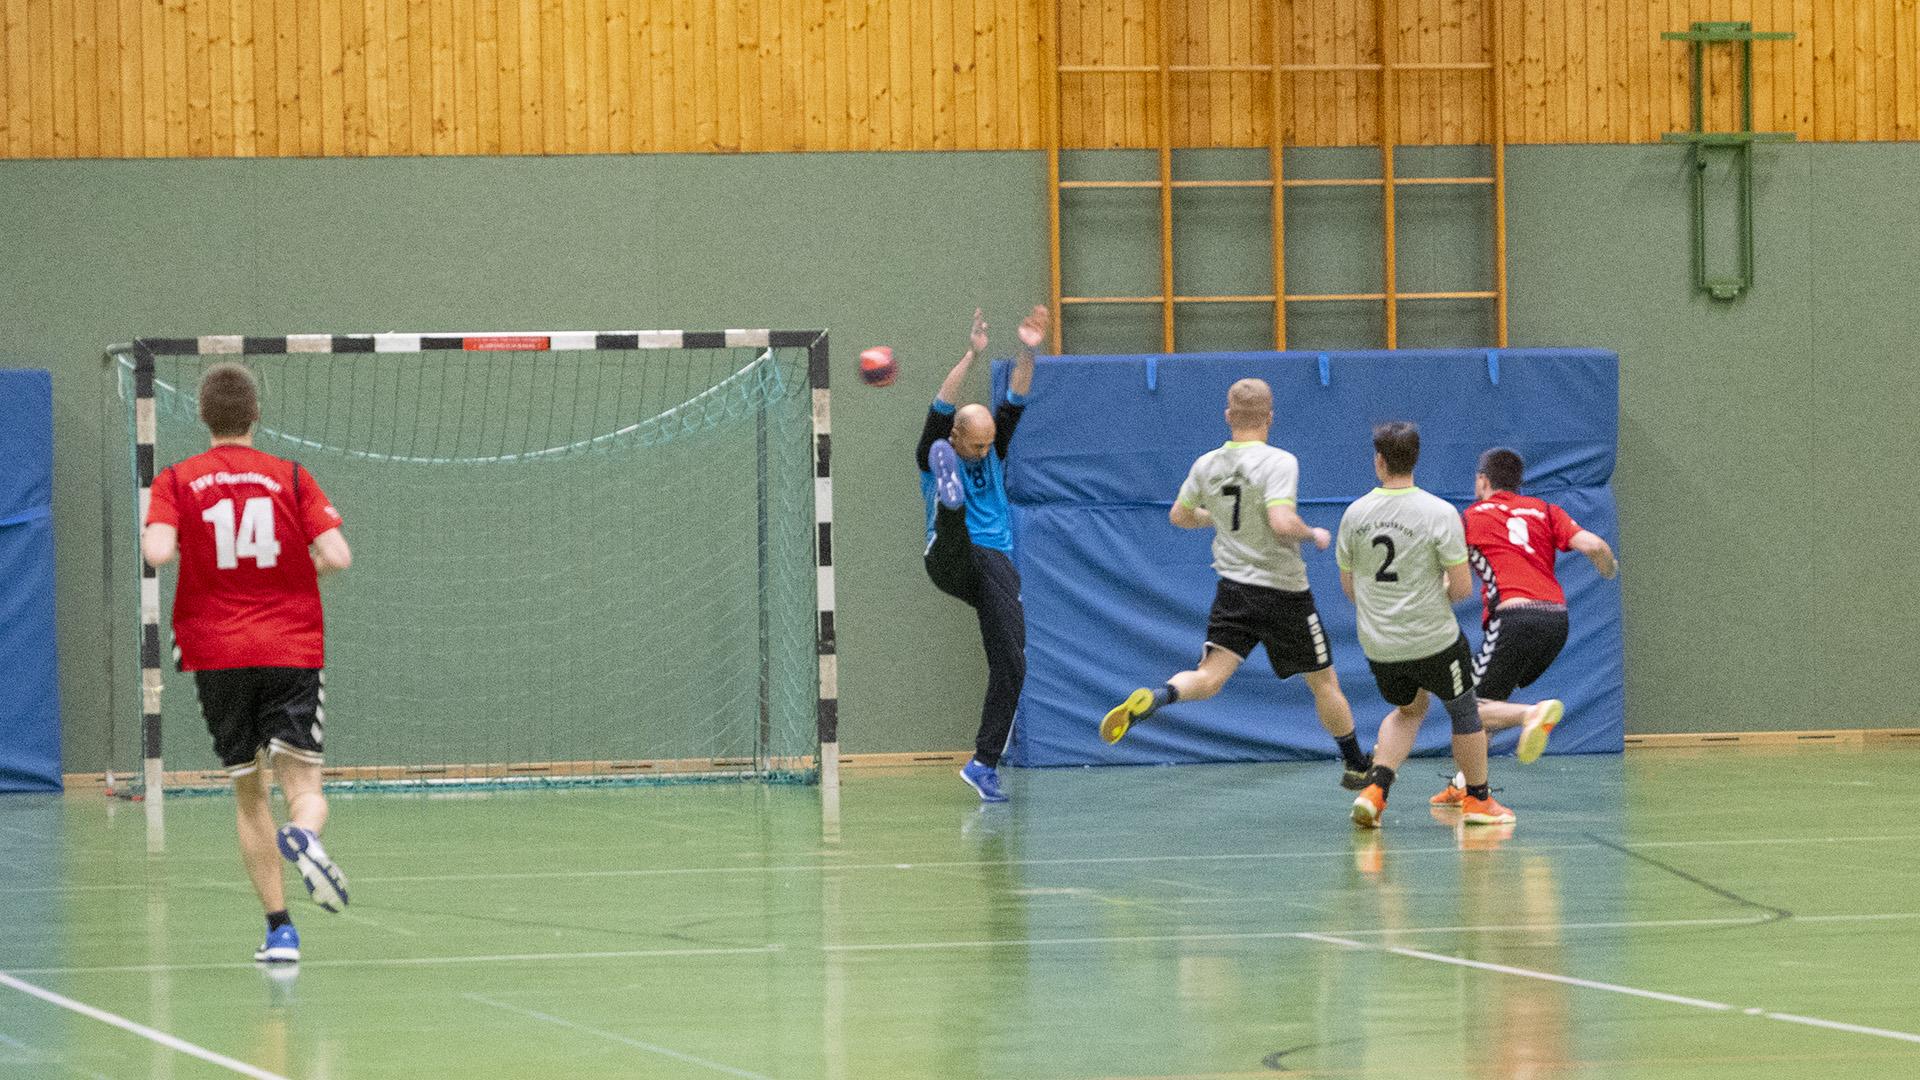 065Slider_Herren2_tsg_leutkirch_handball